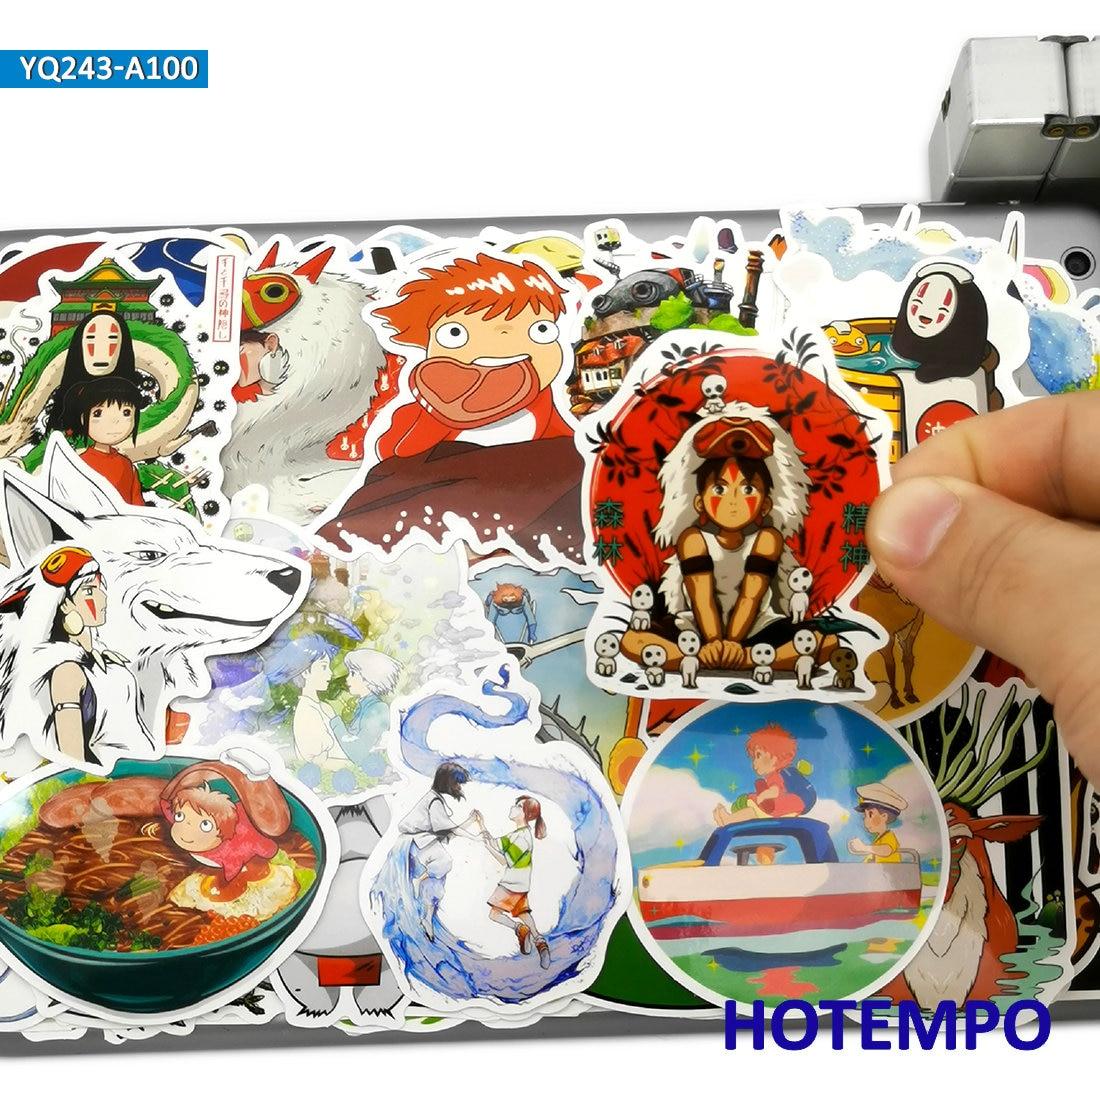 100pcs Manga Miyazaki Hayao Classic Anime Movie Stickers Toys For Kids Mobile Phone Laptop Luggage Skateboard Art Decal Stickers